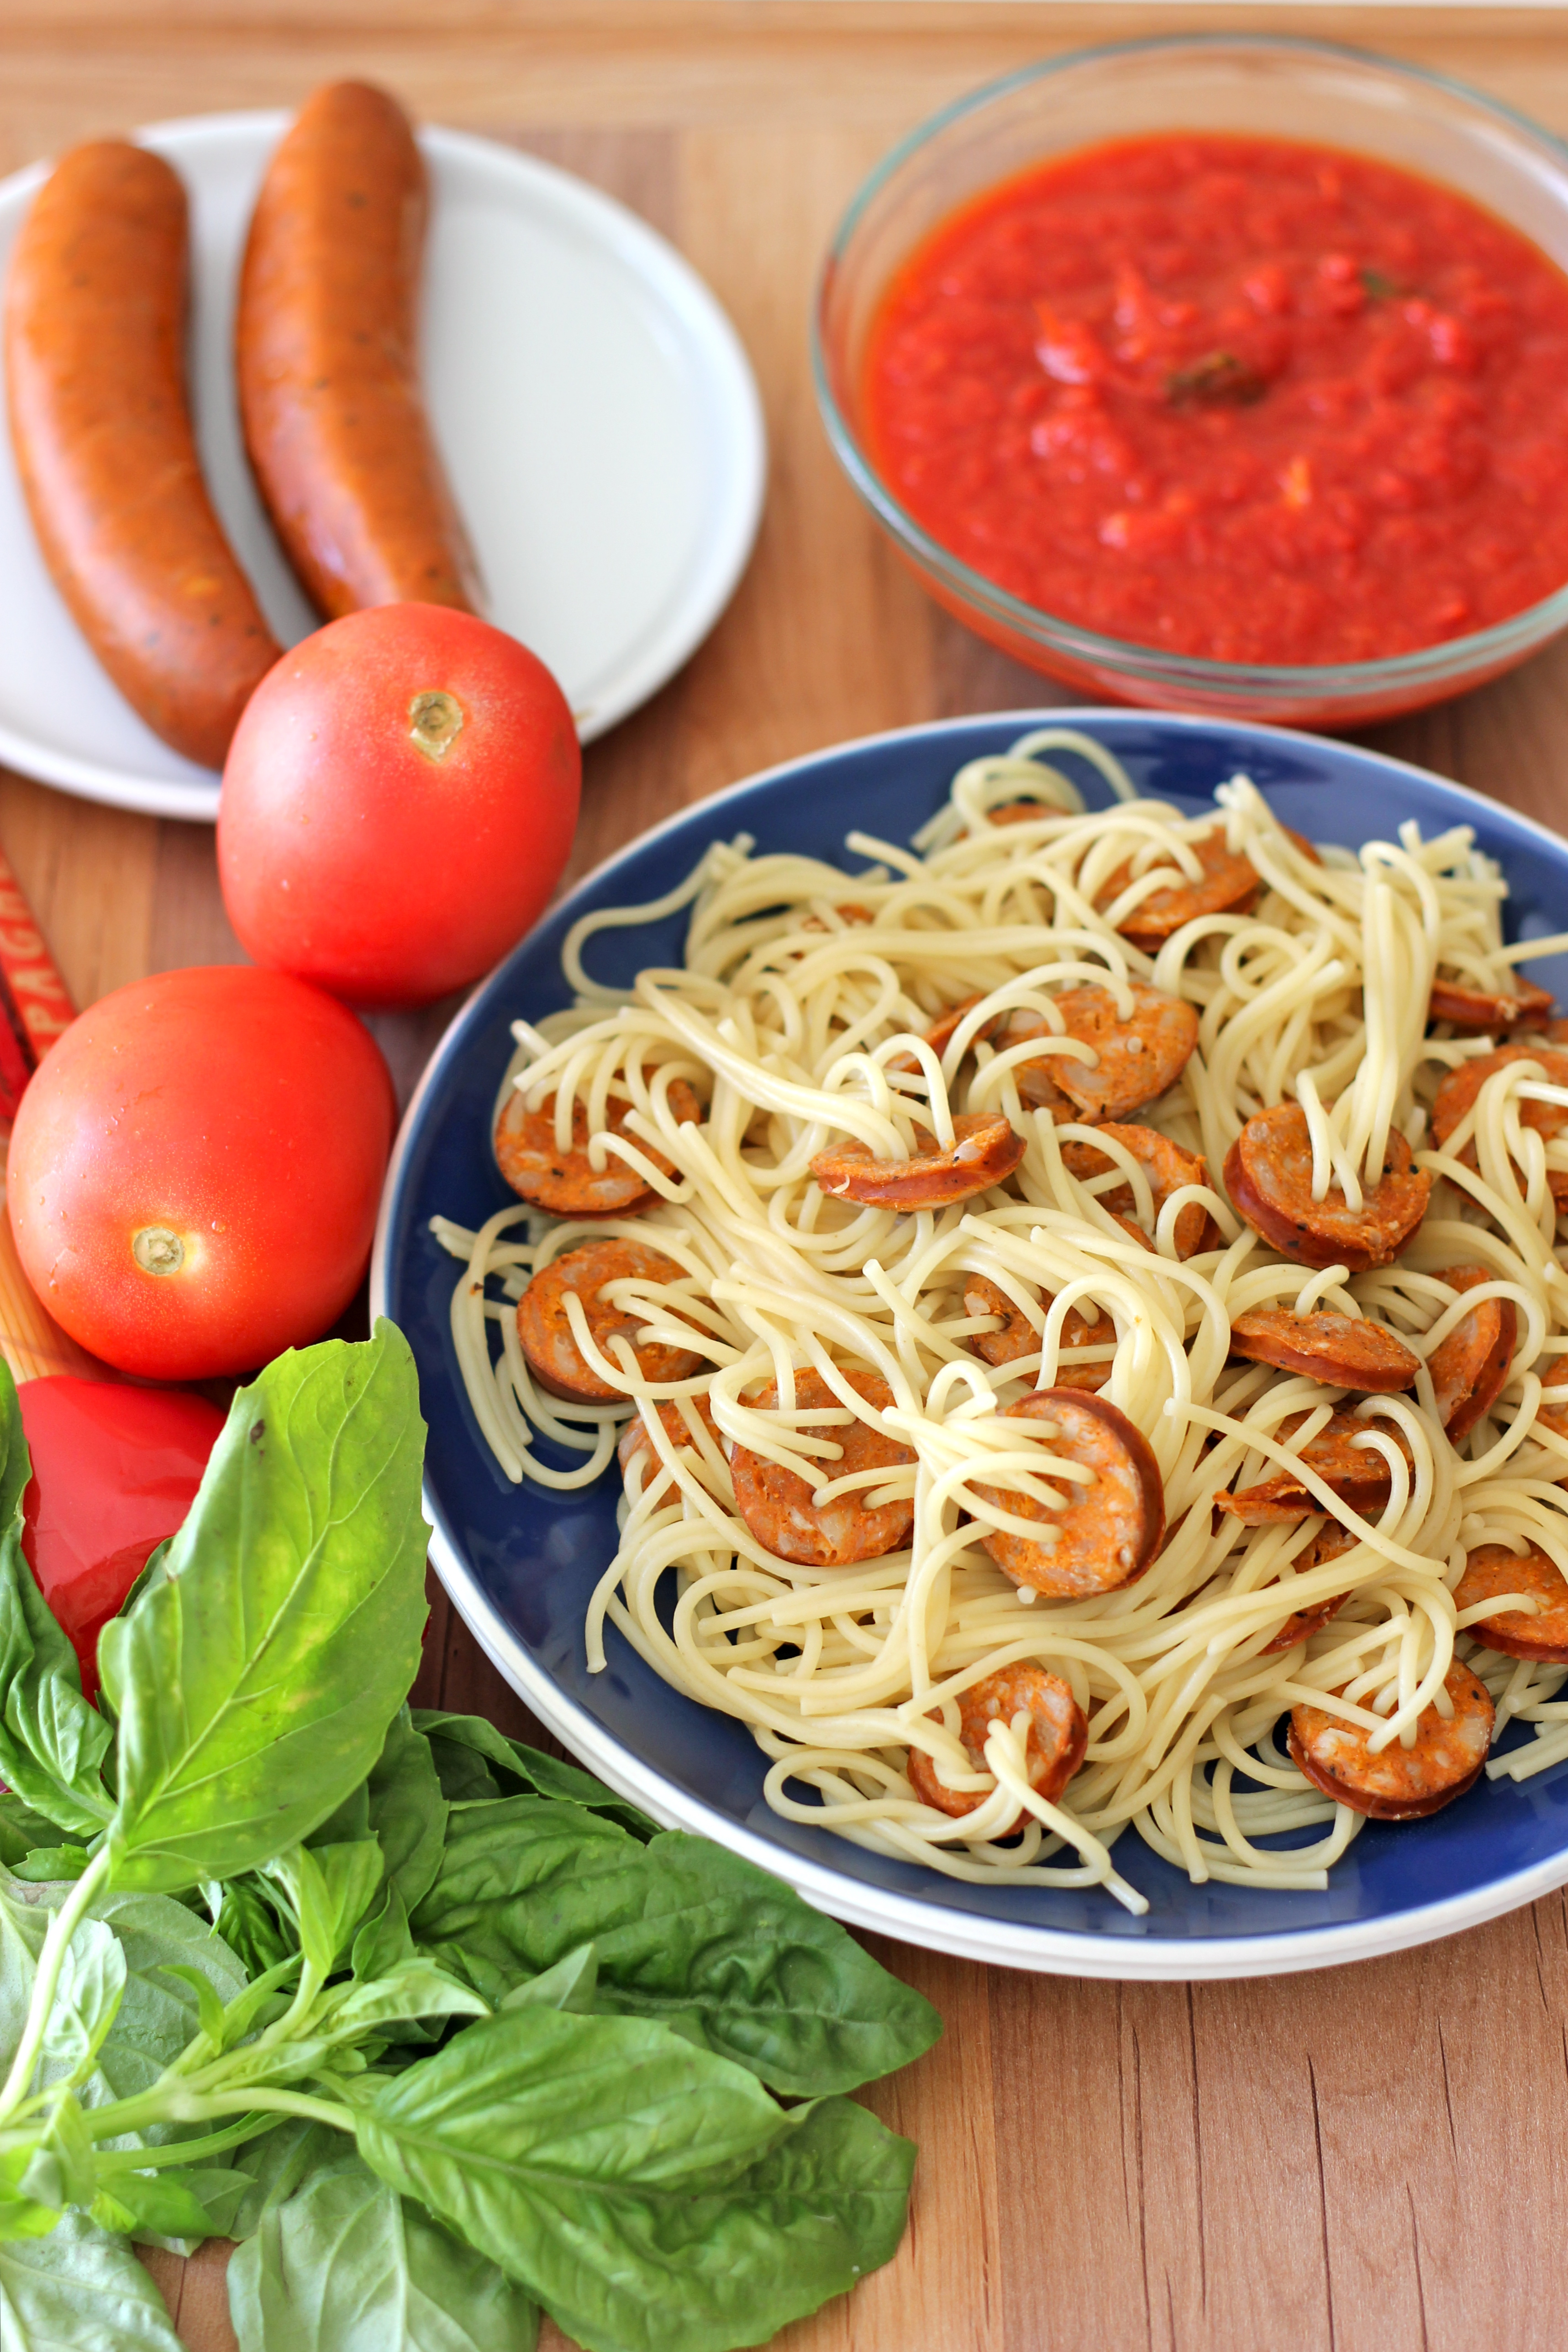 Threaded Spaghetti Hot Dog Bites with Homemade Marinara Sauce